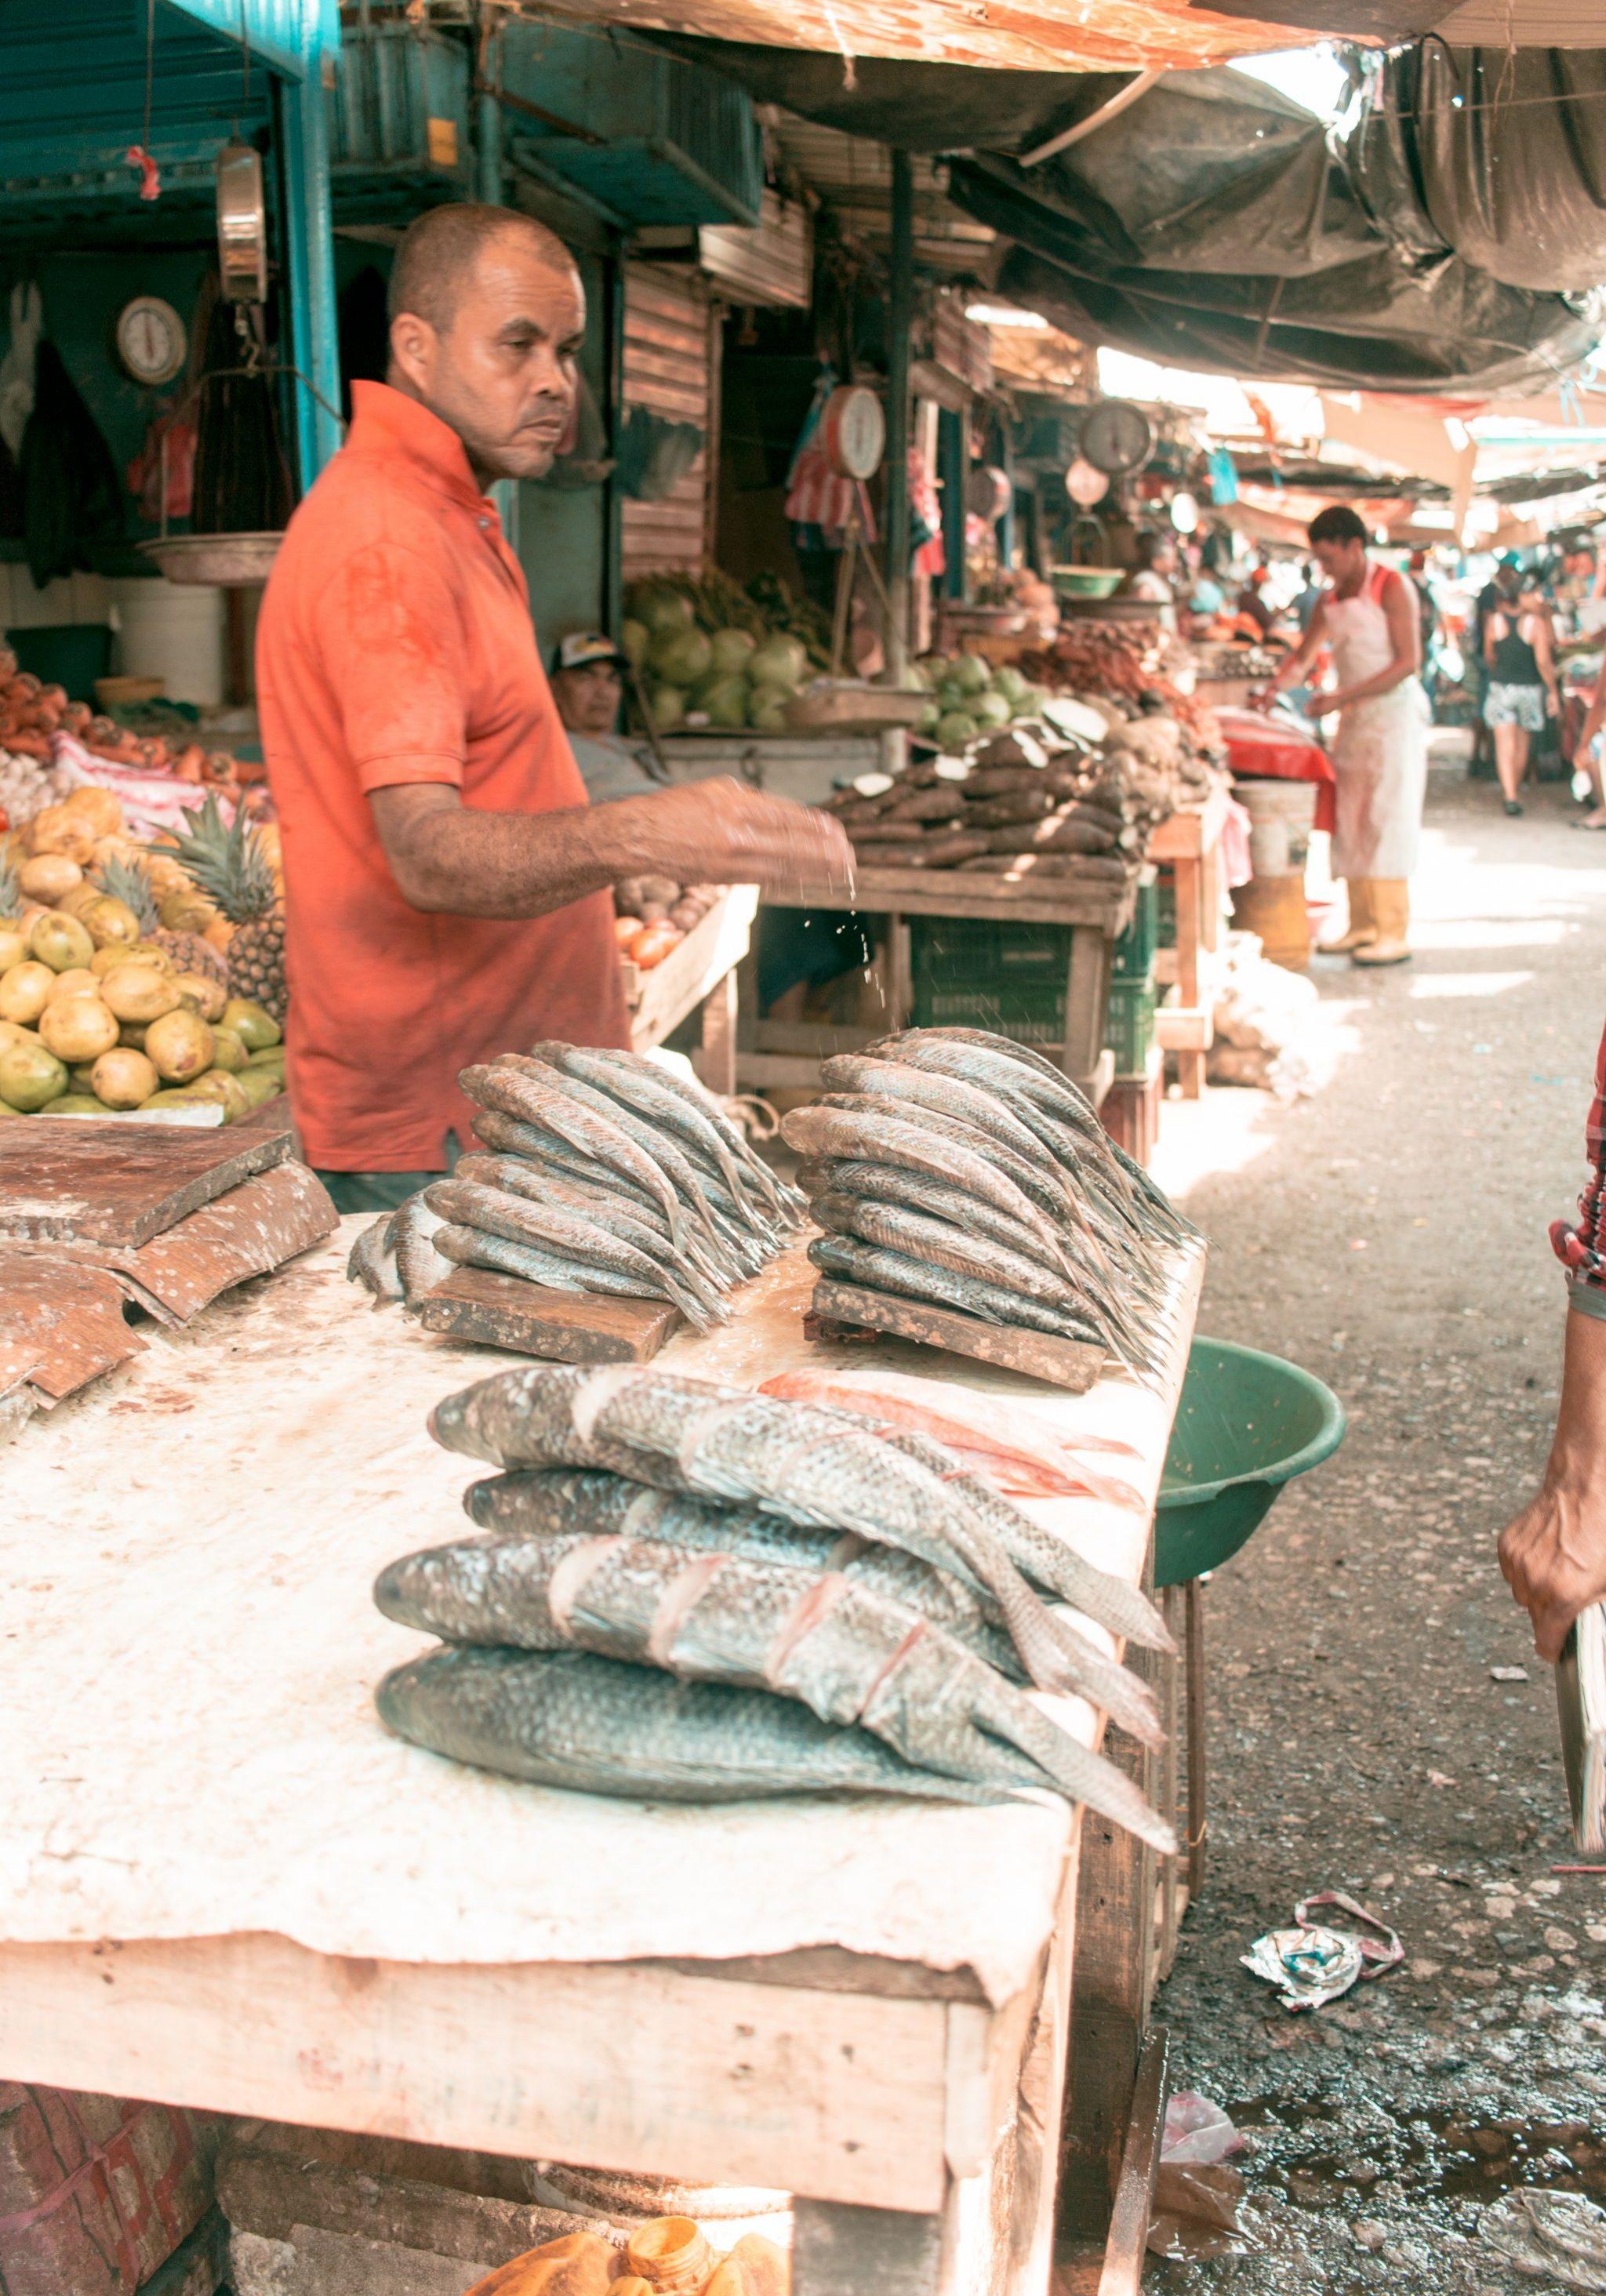 Cartagena Travel Guide Mercado Bazurto fish seller